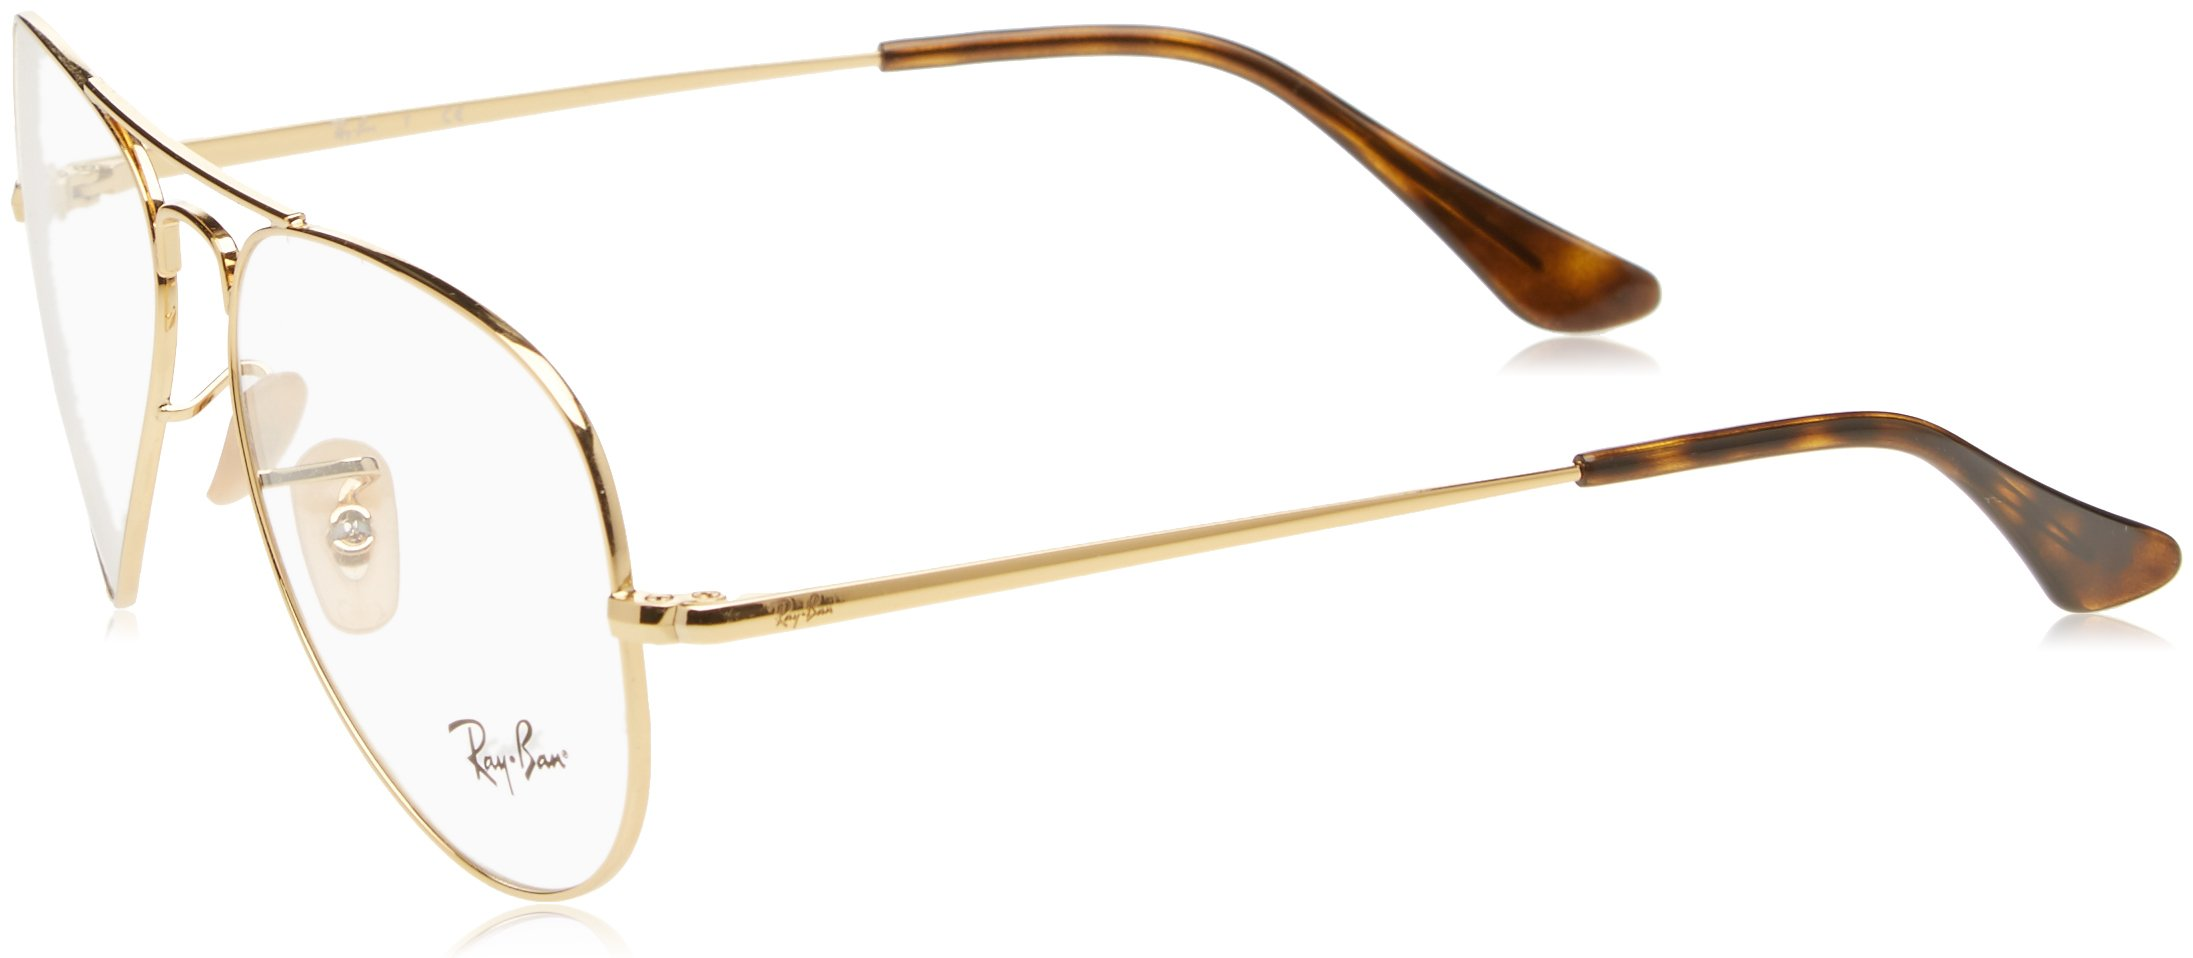 Ray-Ban RX6489 Aviator Metal Eyeglass Frames, Gold/Demo Lens, 58 mm by Ray-Ban